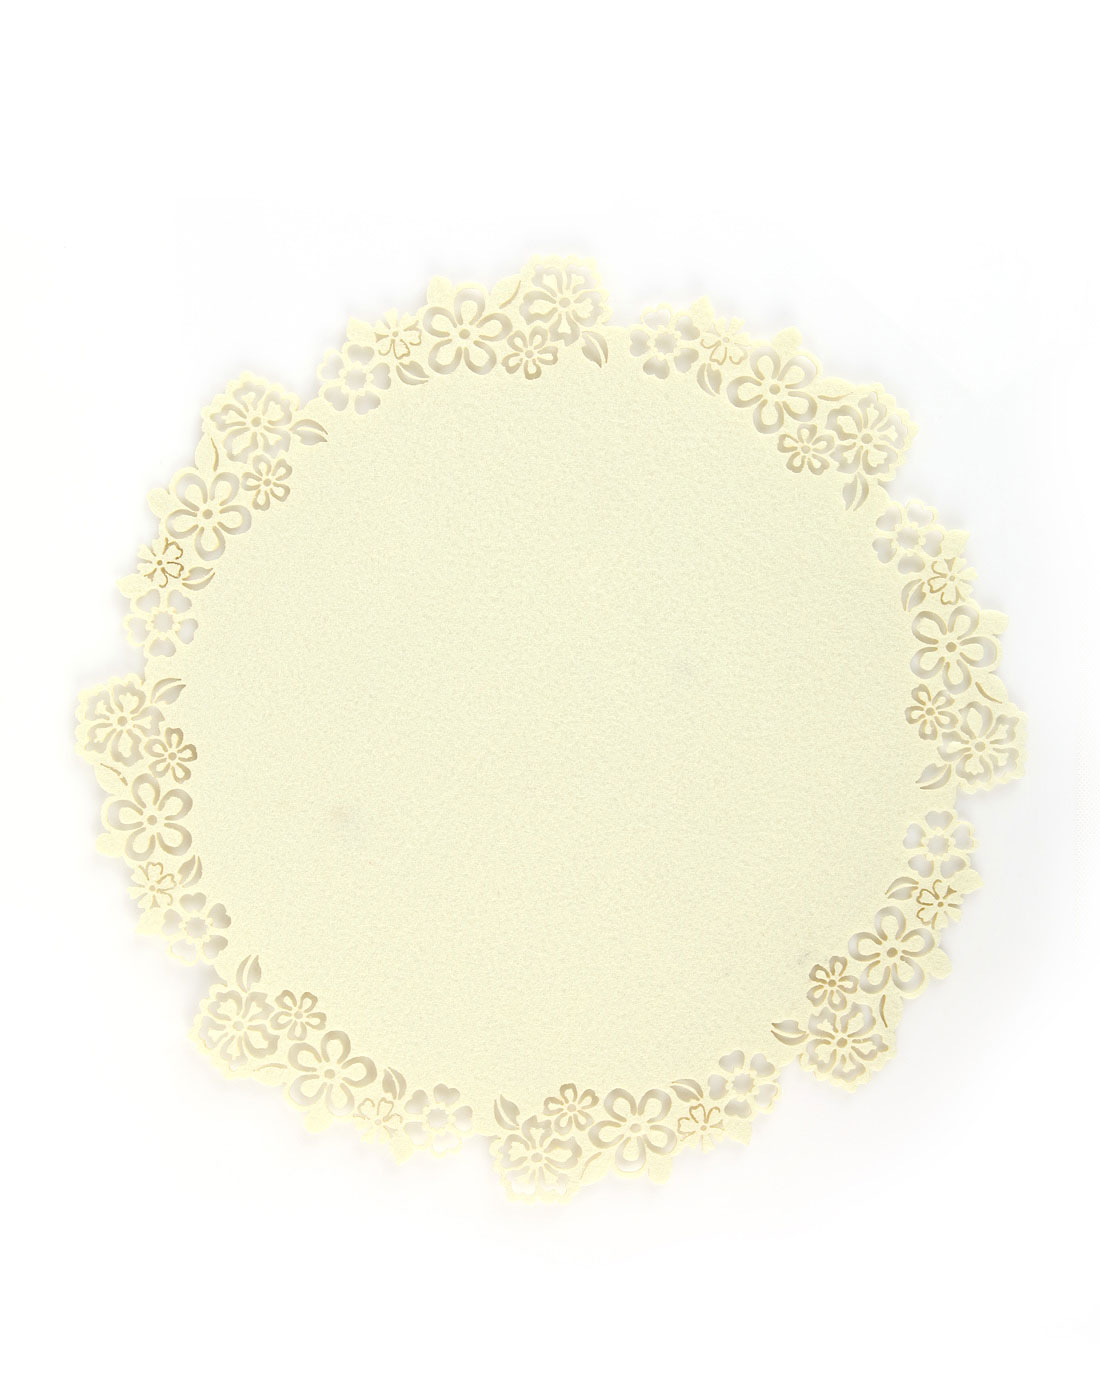 gapon&homix混合镂空花朵圆形隔热毛毡餐垫-乳白色cf